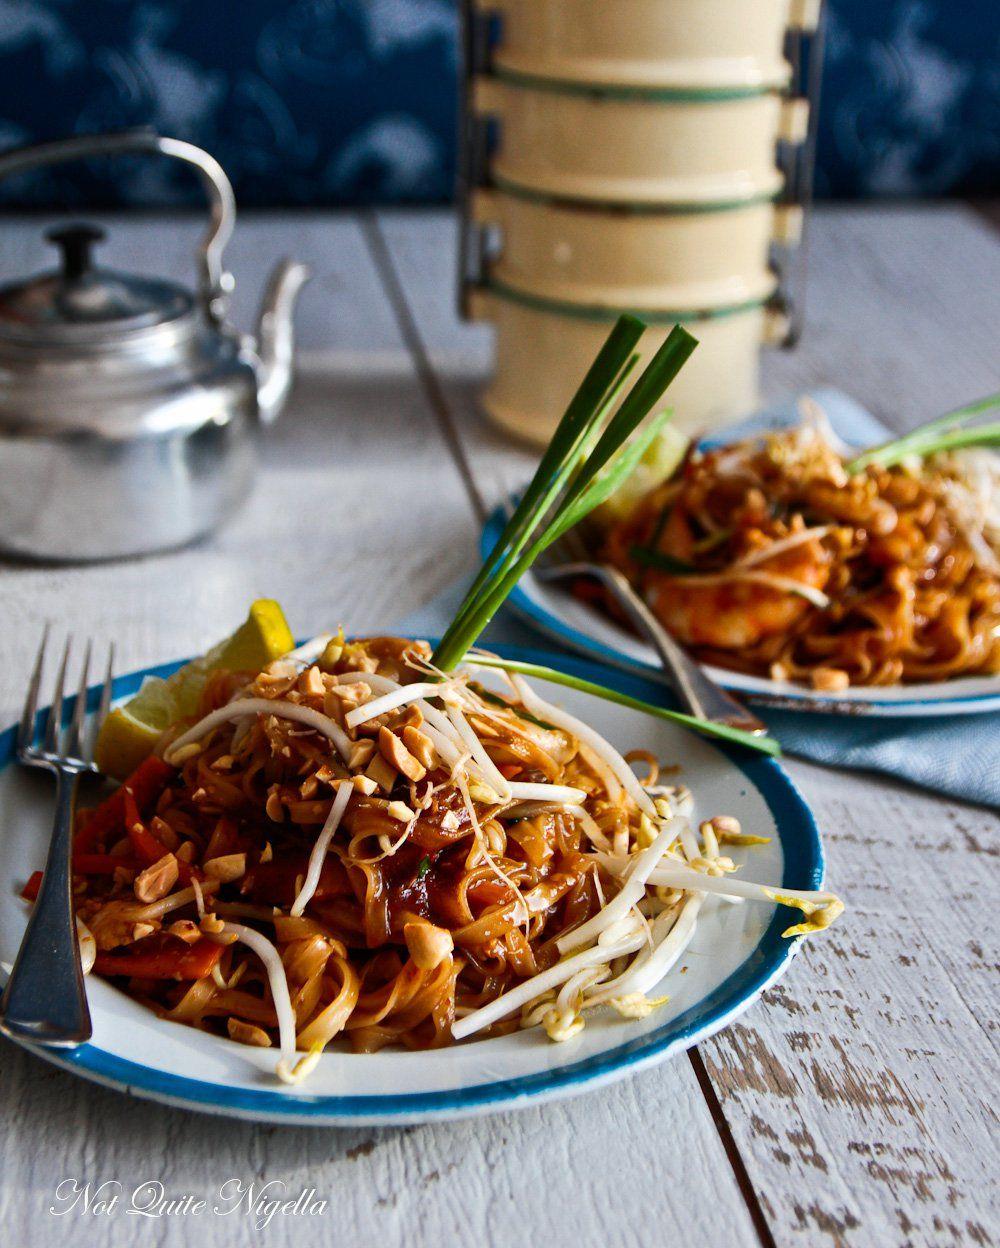 An Authentic Pad Thai The Pursuit Of A Recipe Super Stir Fry S